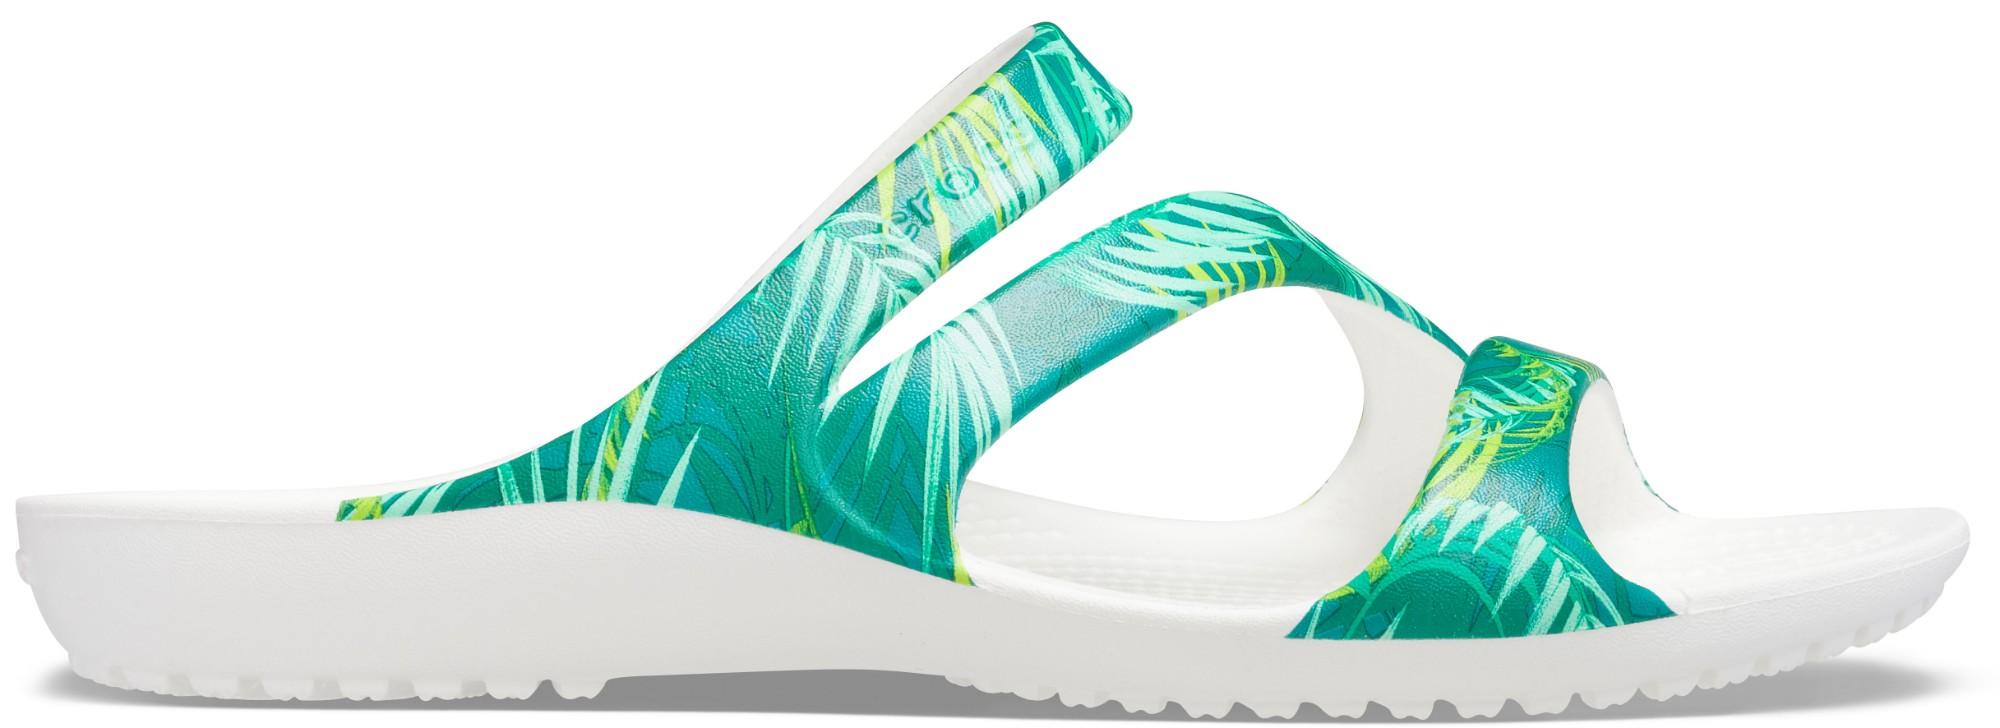 Crocs™ Kadee II Tropical Sandal Women's White/Multi 39,5